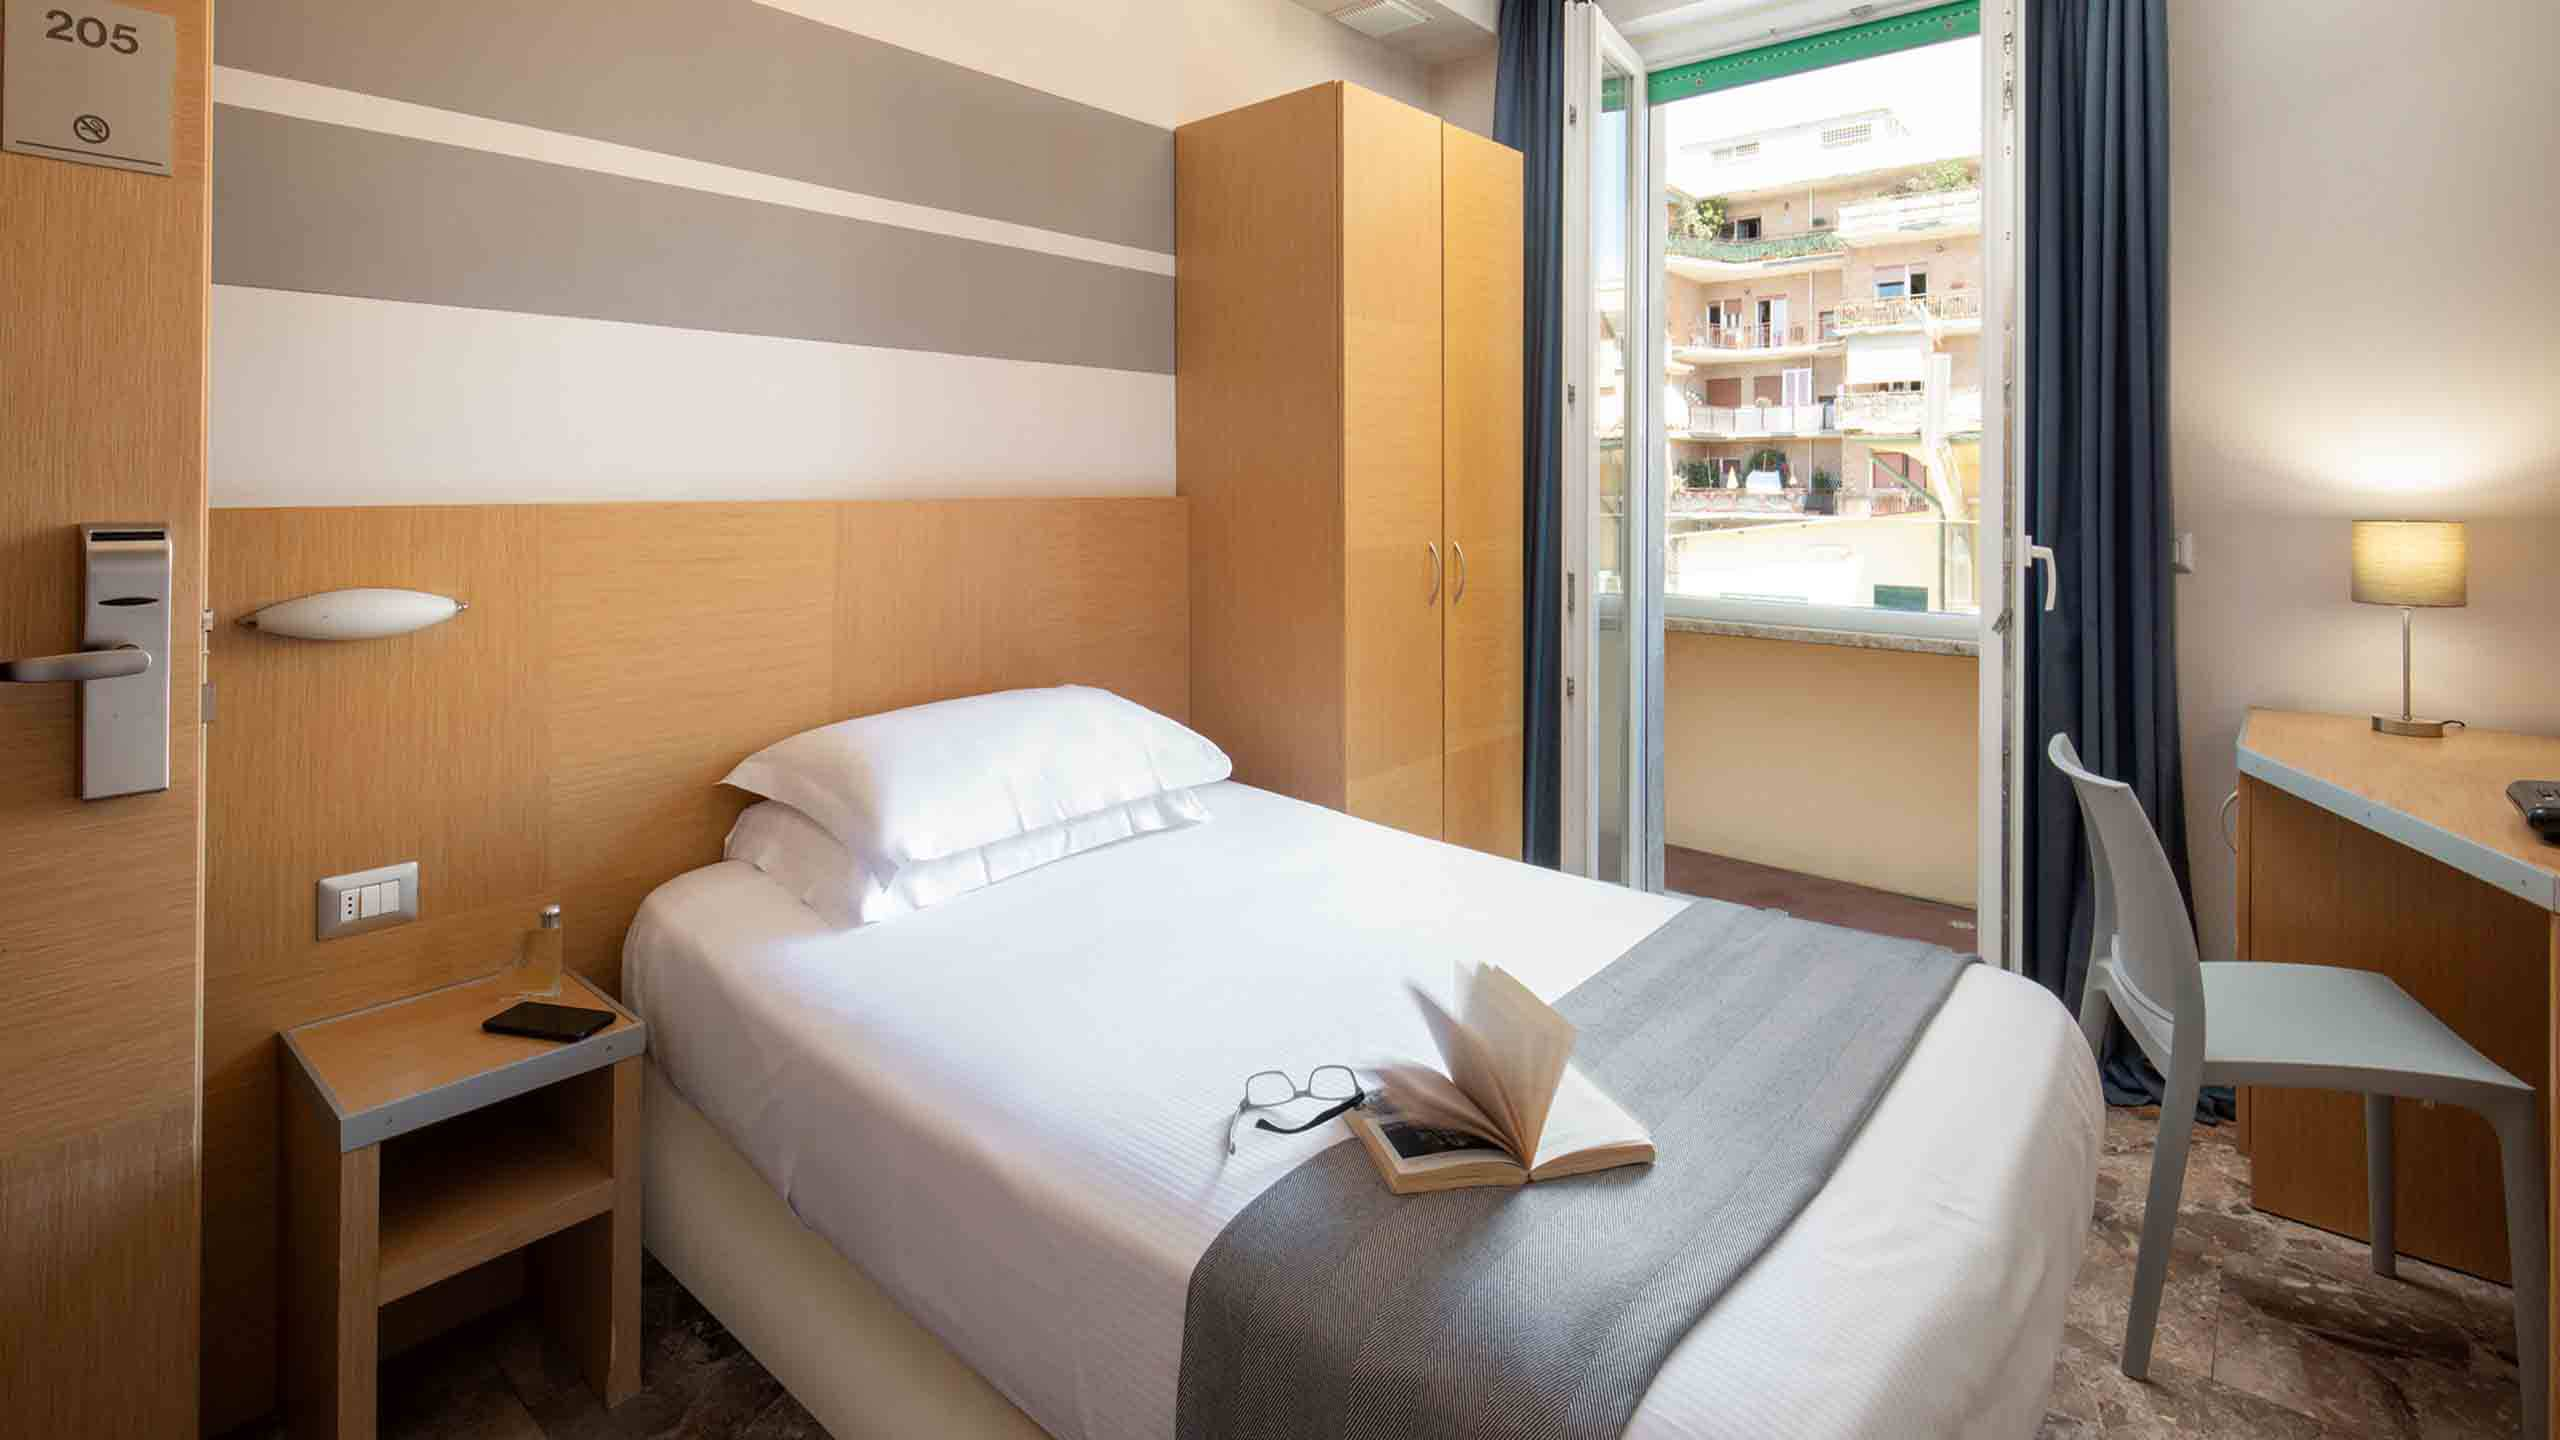 Hotel-La-Scaletta-Ostia-Camera-Singola-7